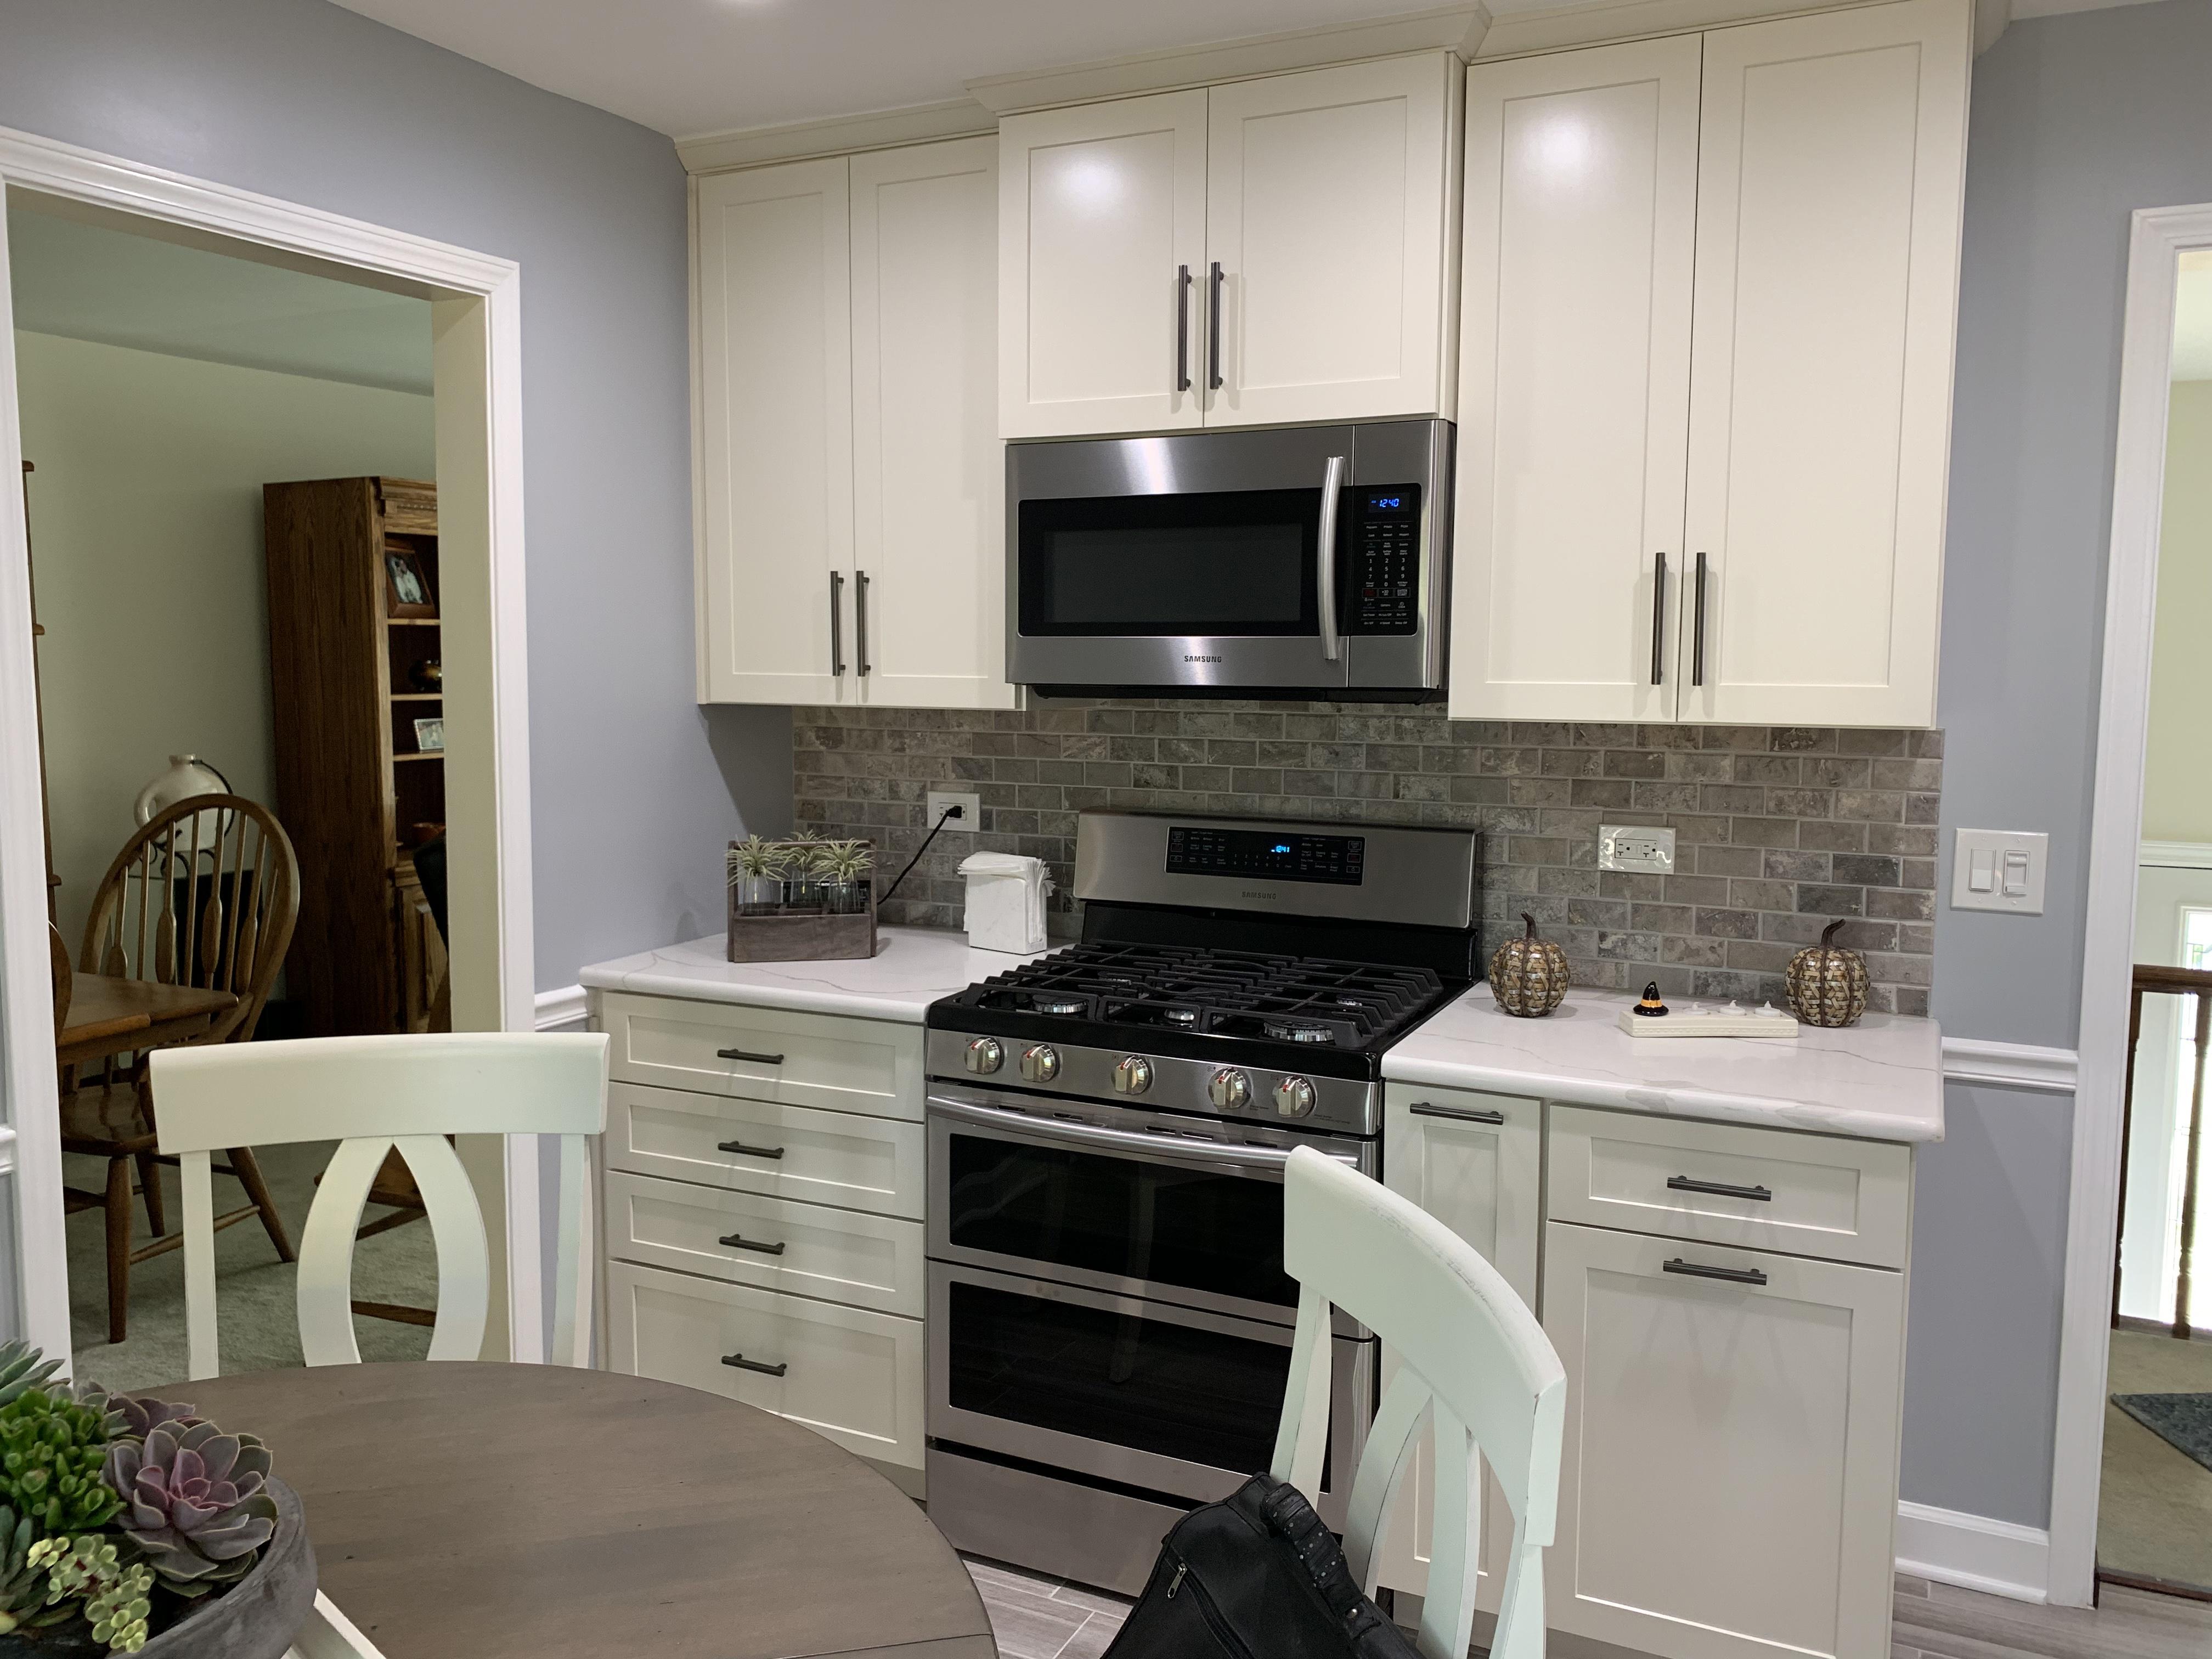 Barbara S -Elk Grove Kitchen After 3